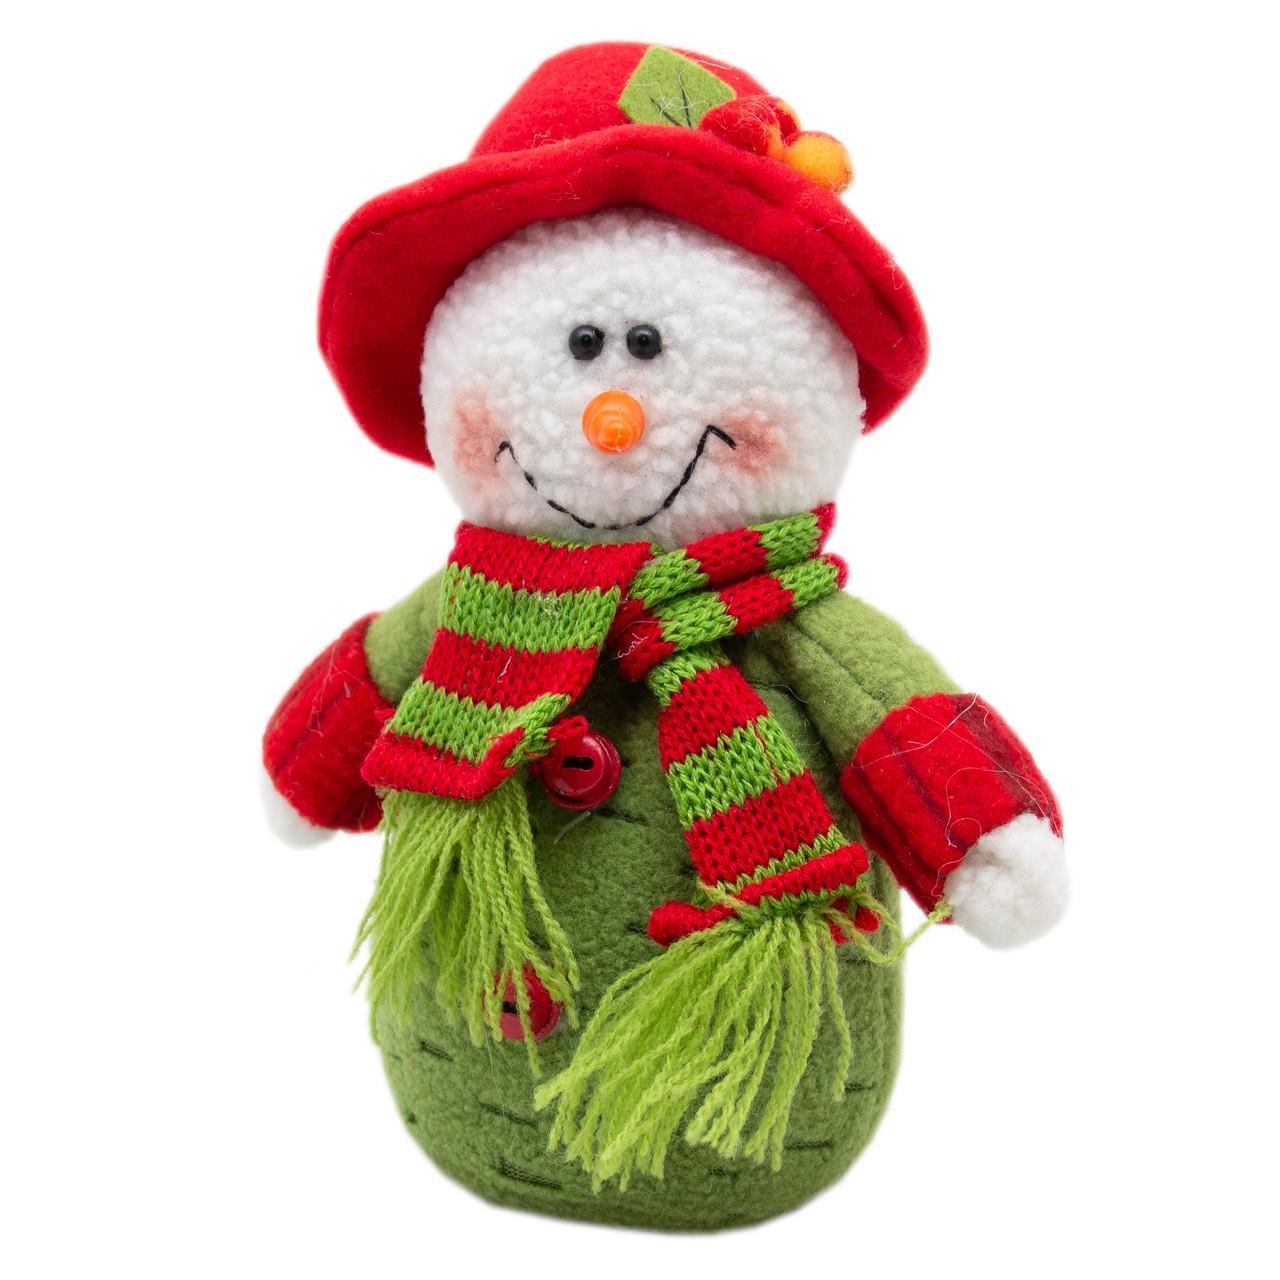 Новогодний сувенир Снеговик, 15 см, (000081-1)